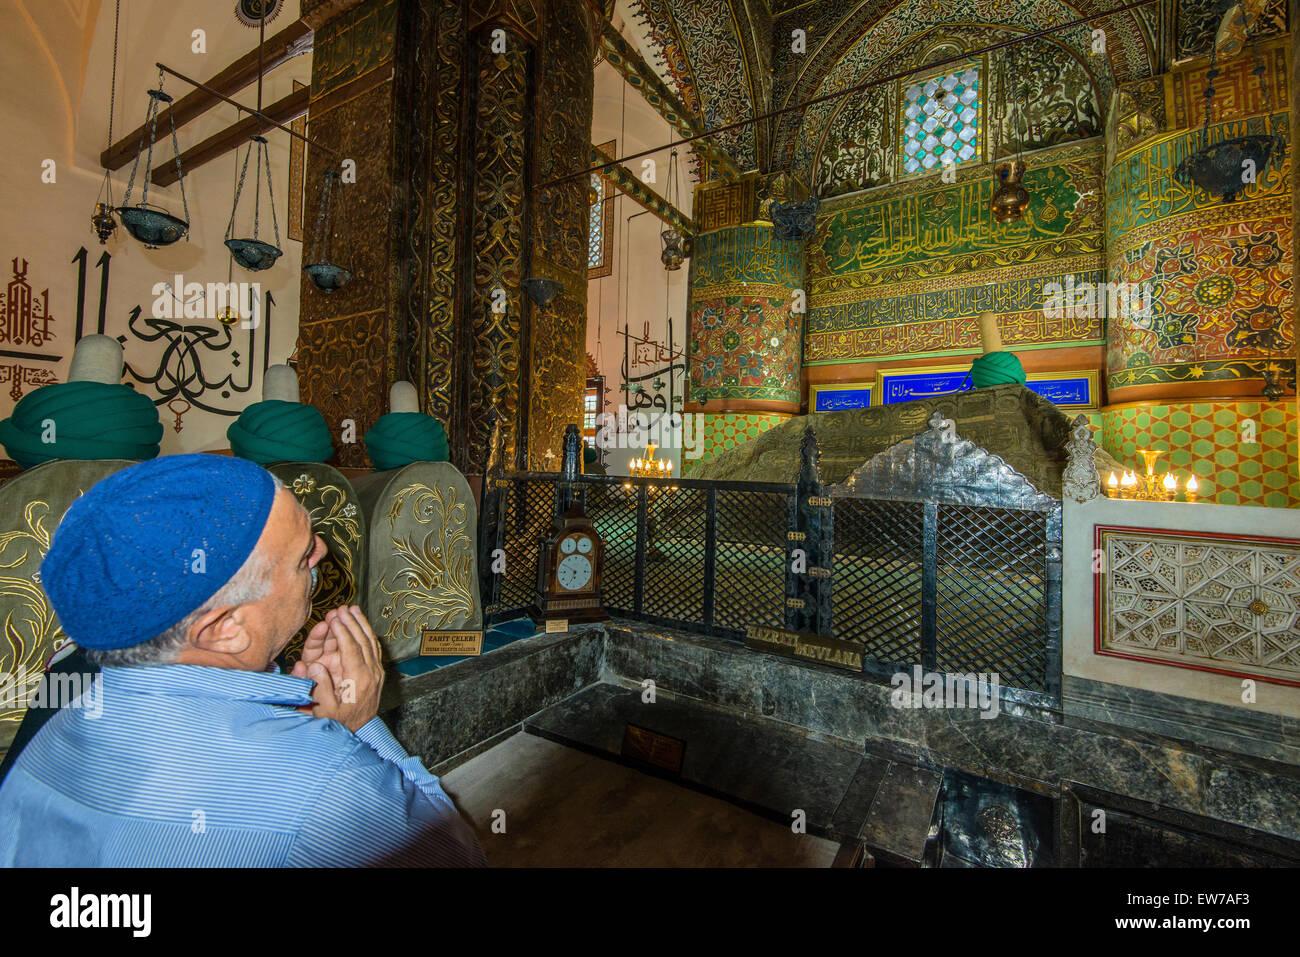 Worshiper praying on Mevlana's Tomb at Mevlana Museum, Konya, Turkey - Stock Image